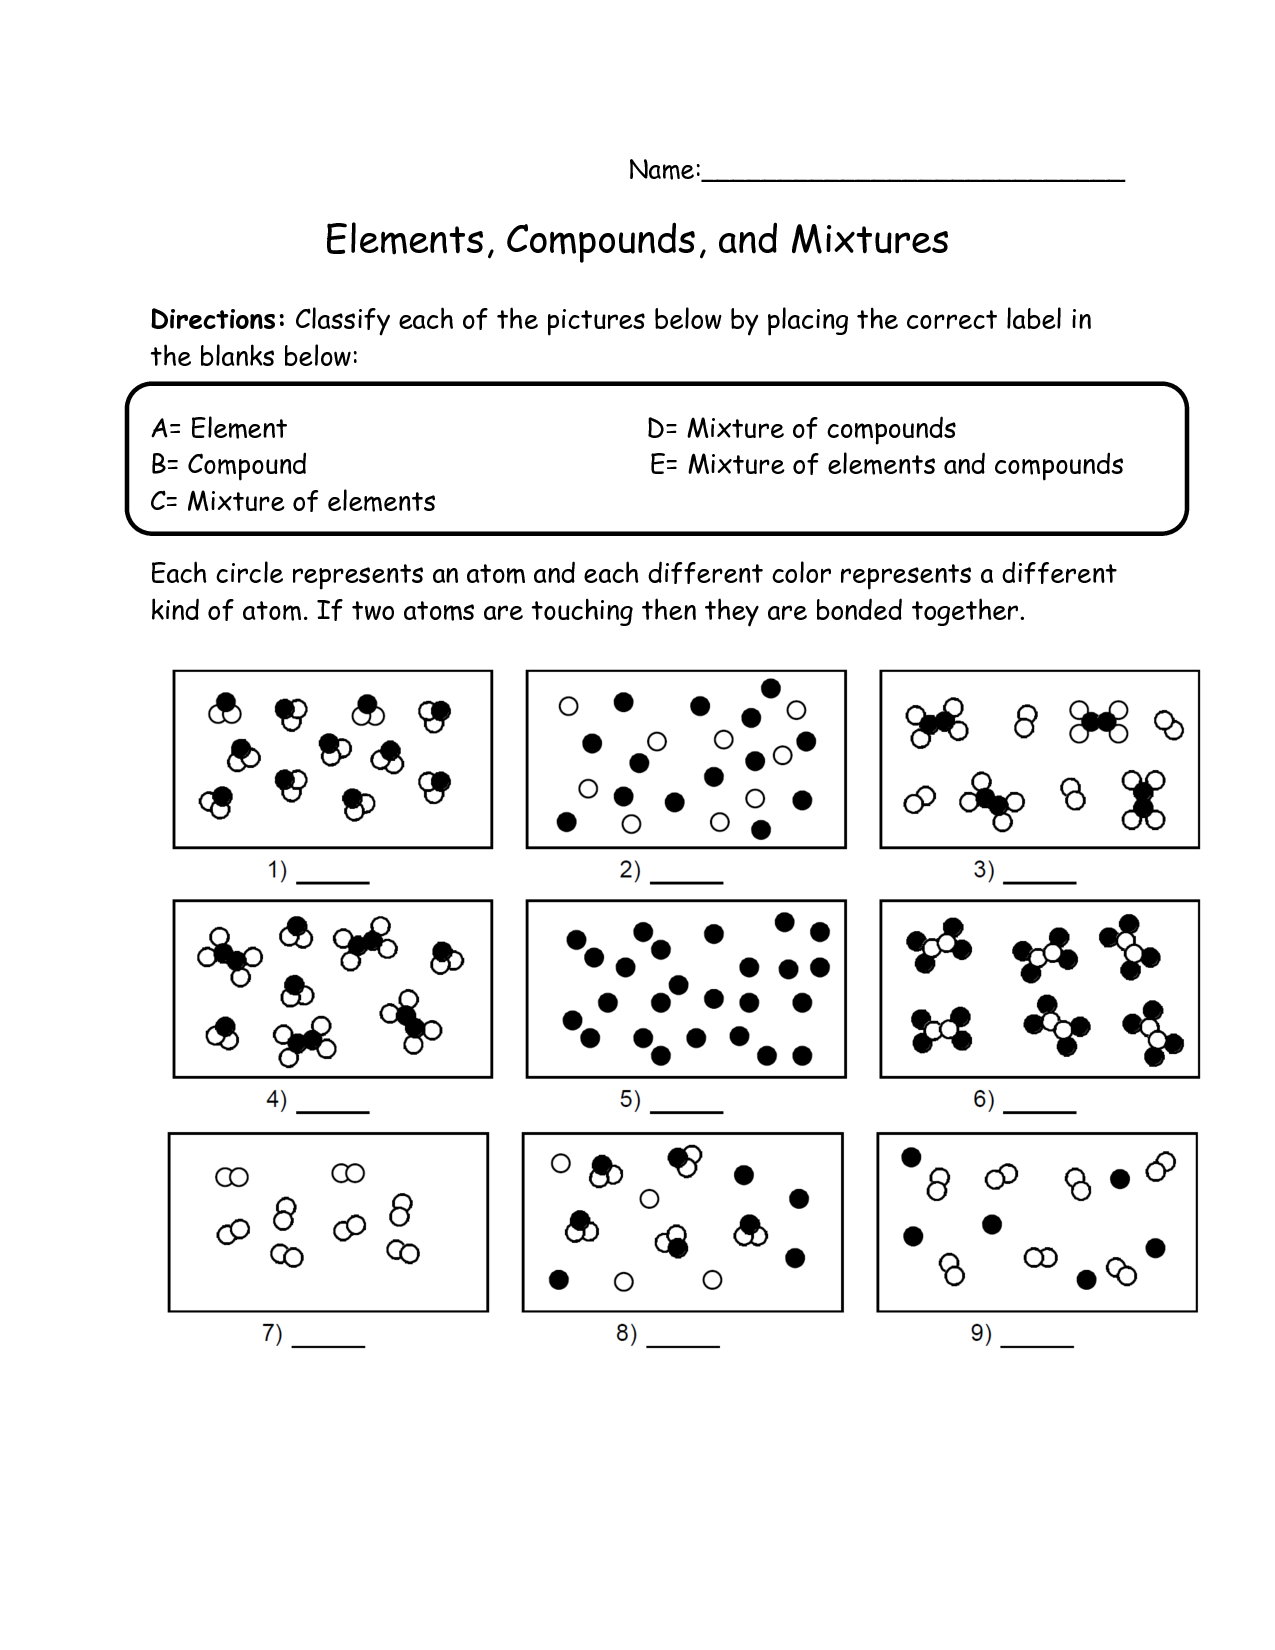 Elements Compounds And Mixtures Worksheets Davezan, Elements